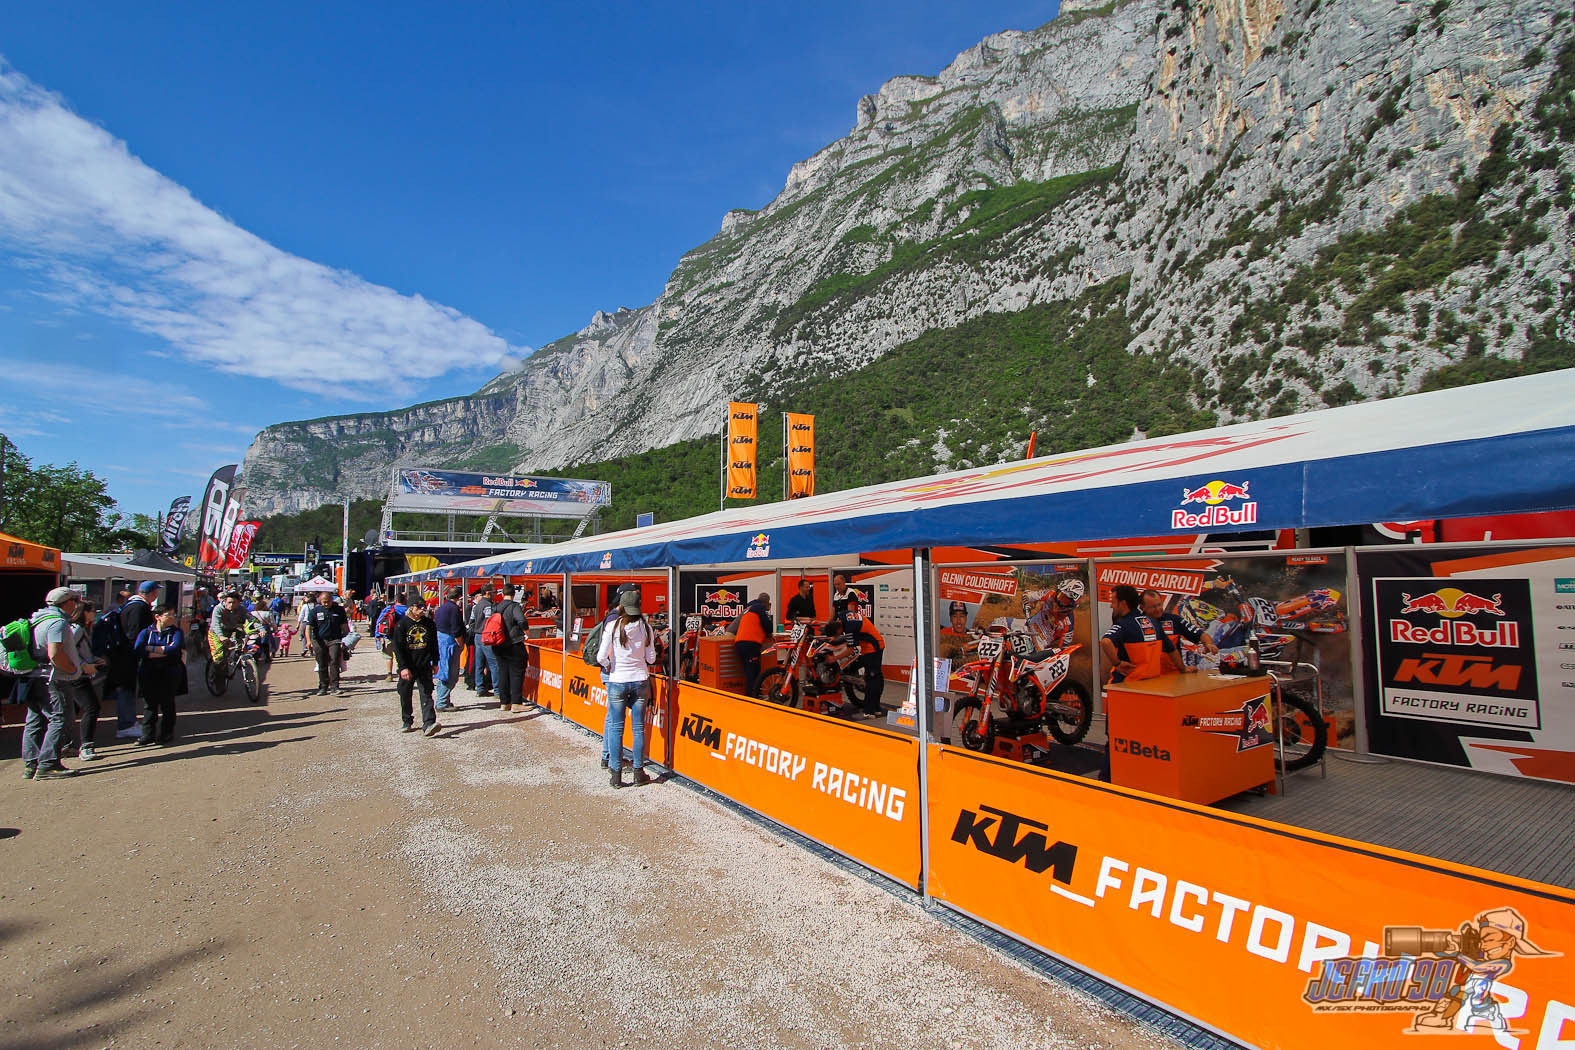 Paddock view - Photo Gallery: MXGP of Trentino, Italy - Motocross Pictures - Vital MX